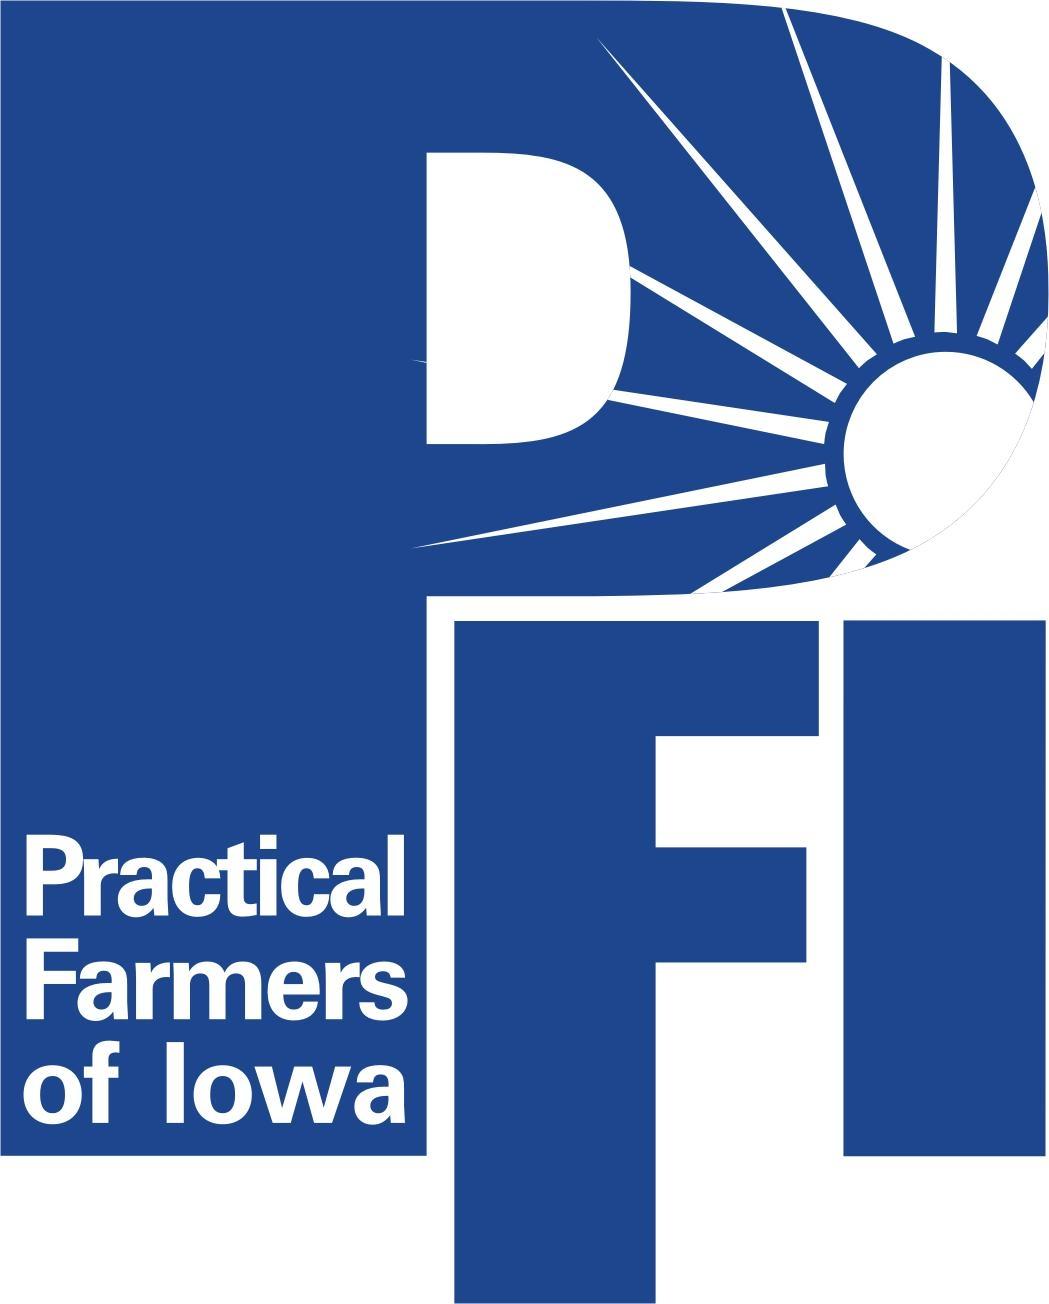 PFI_logo